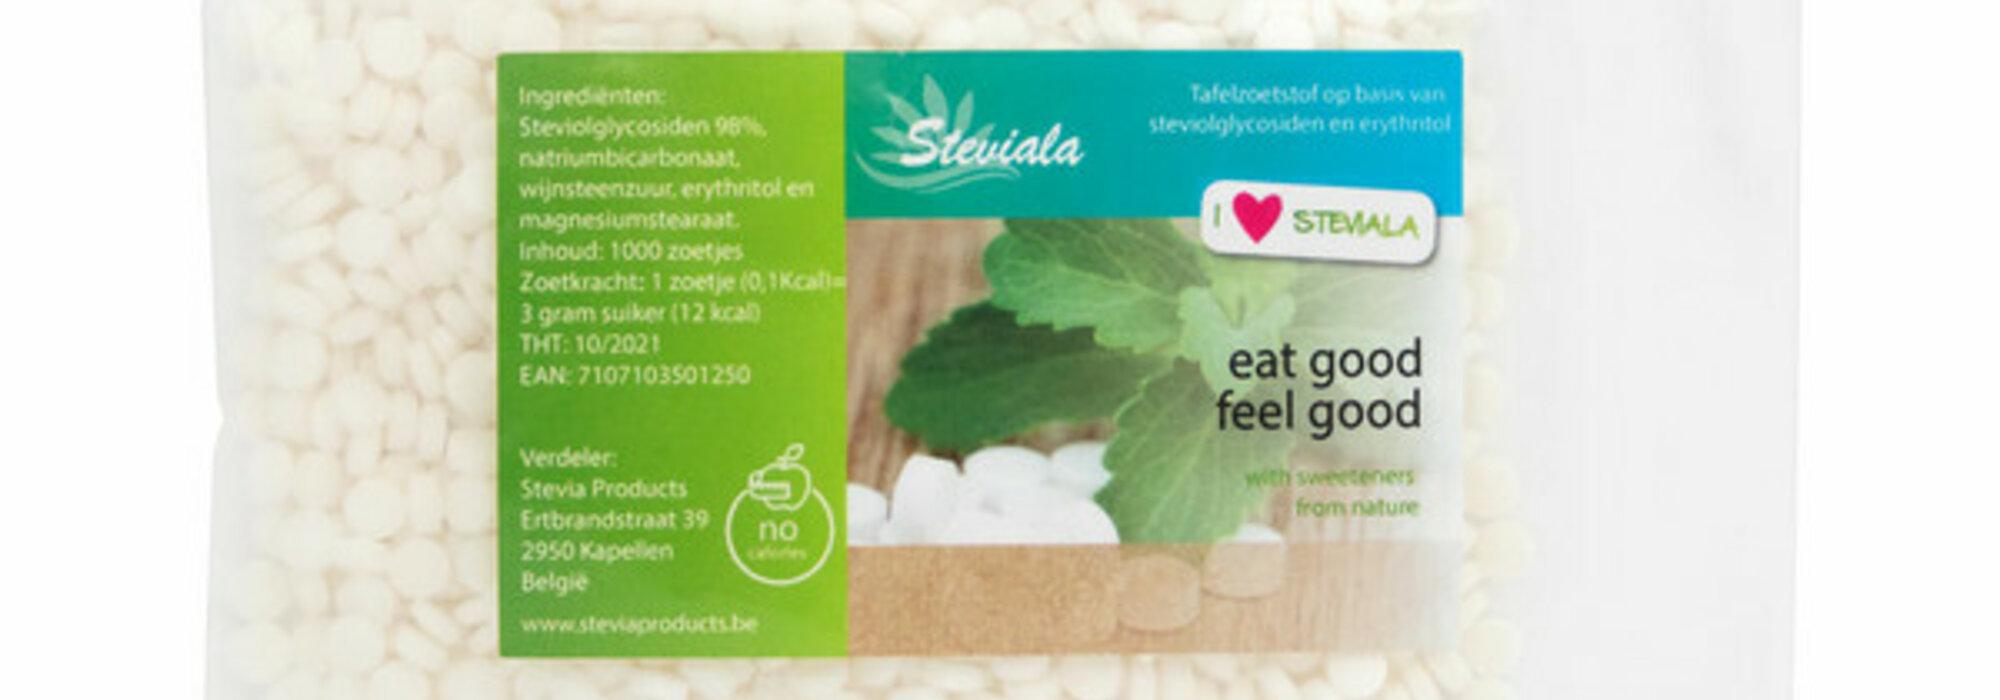 Stevia zoetjes kopen